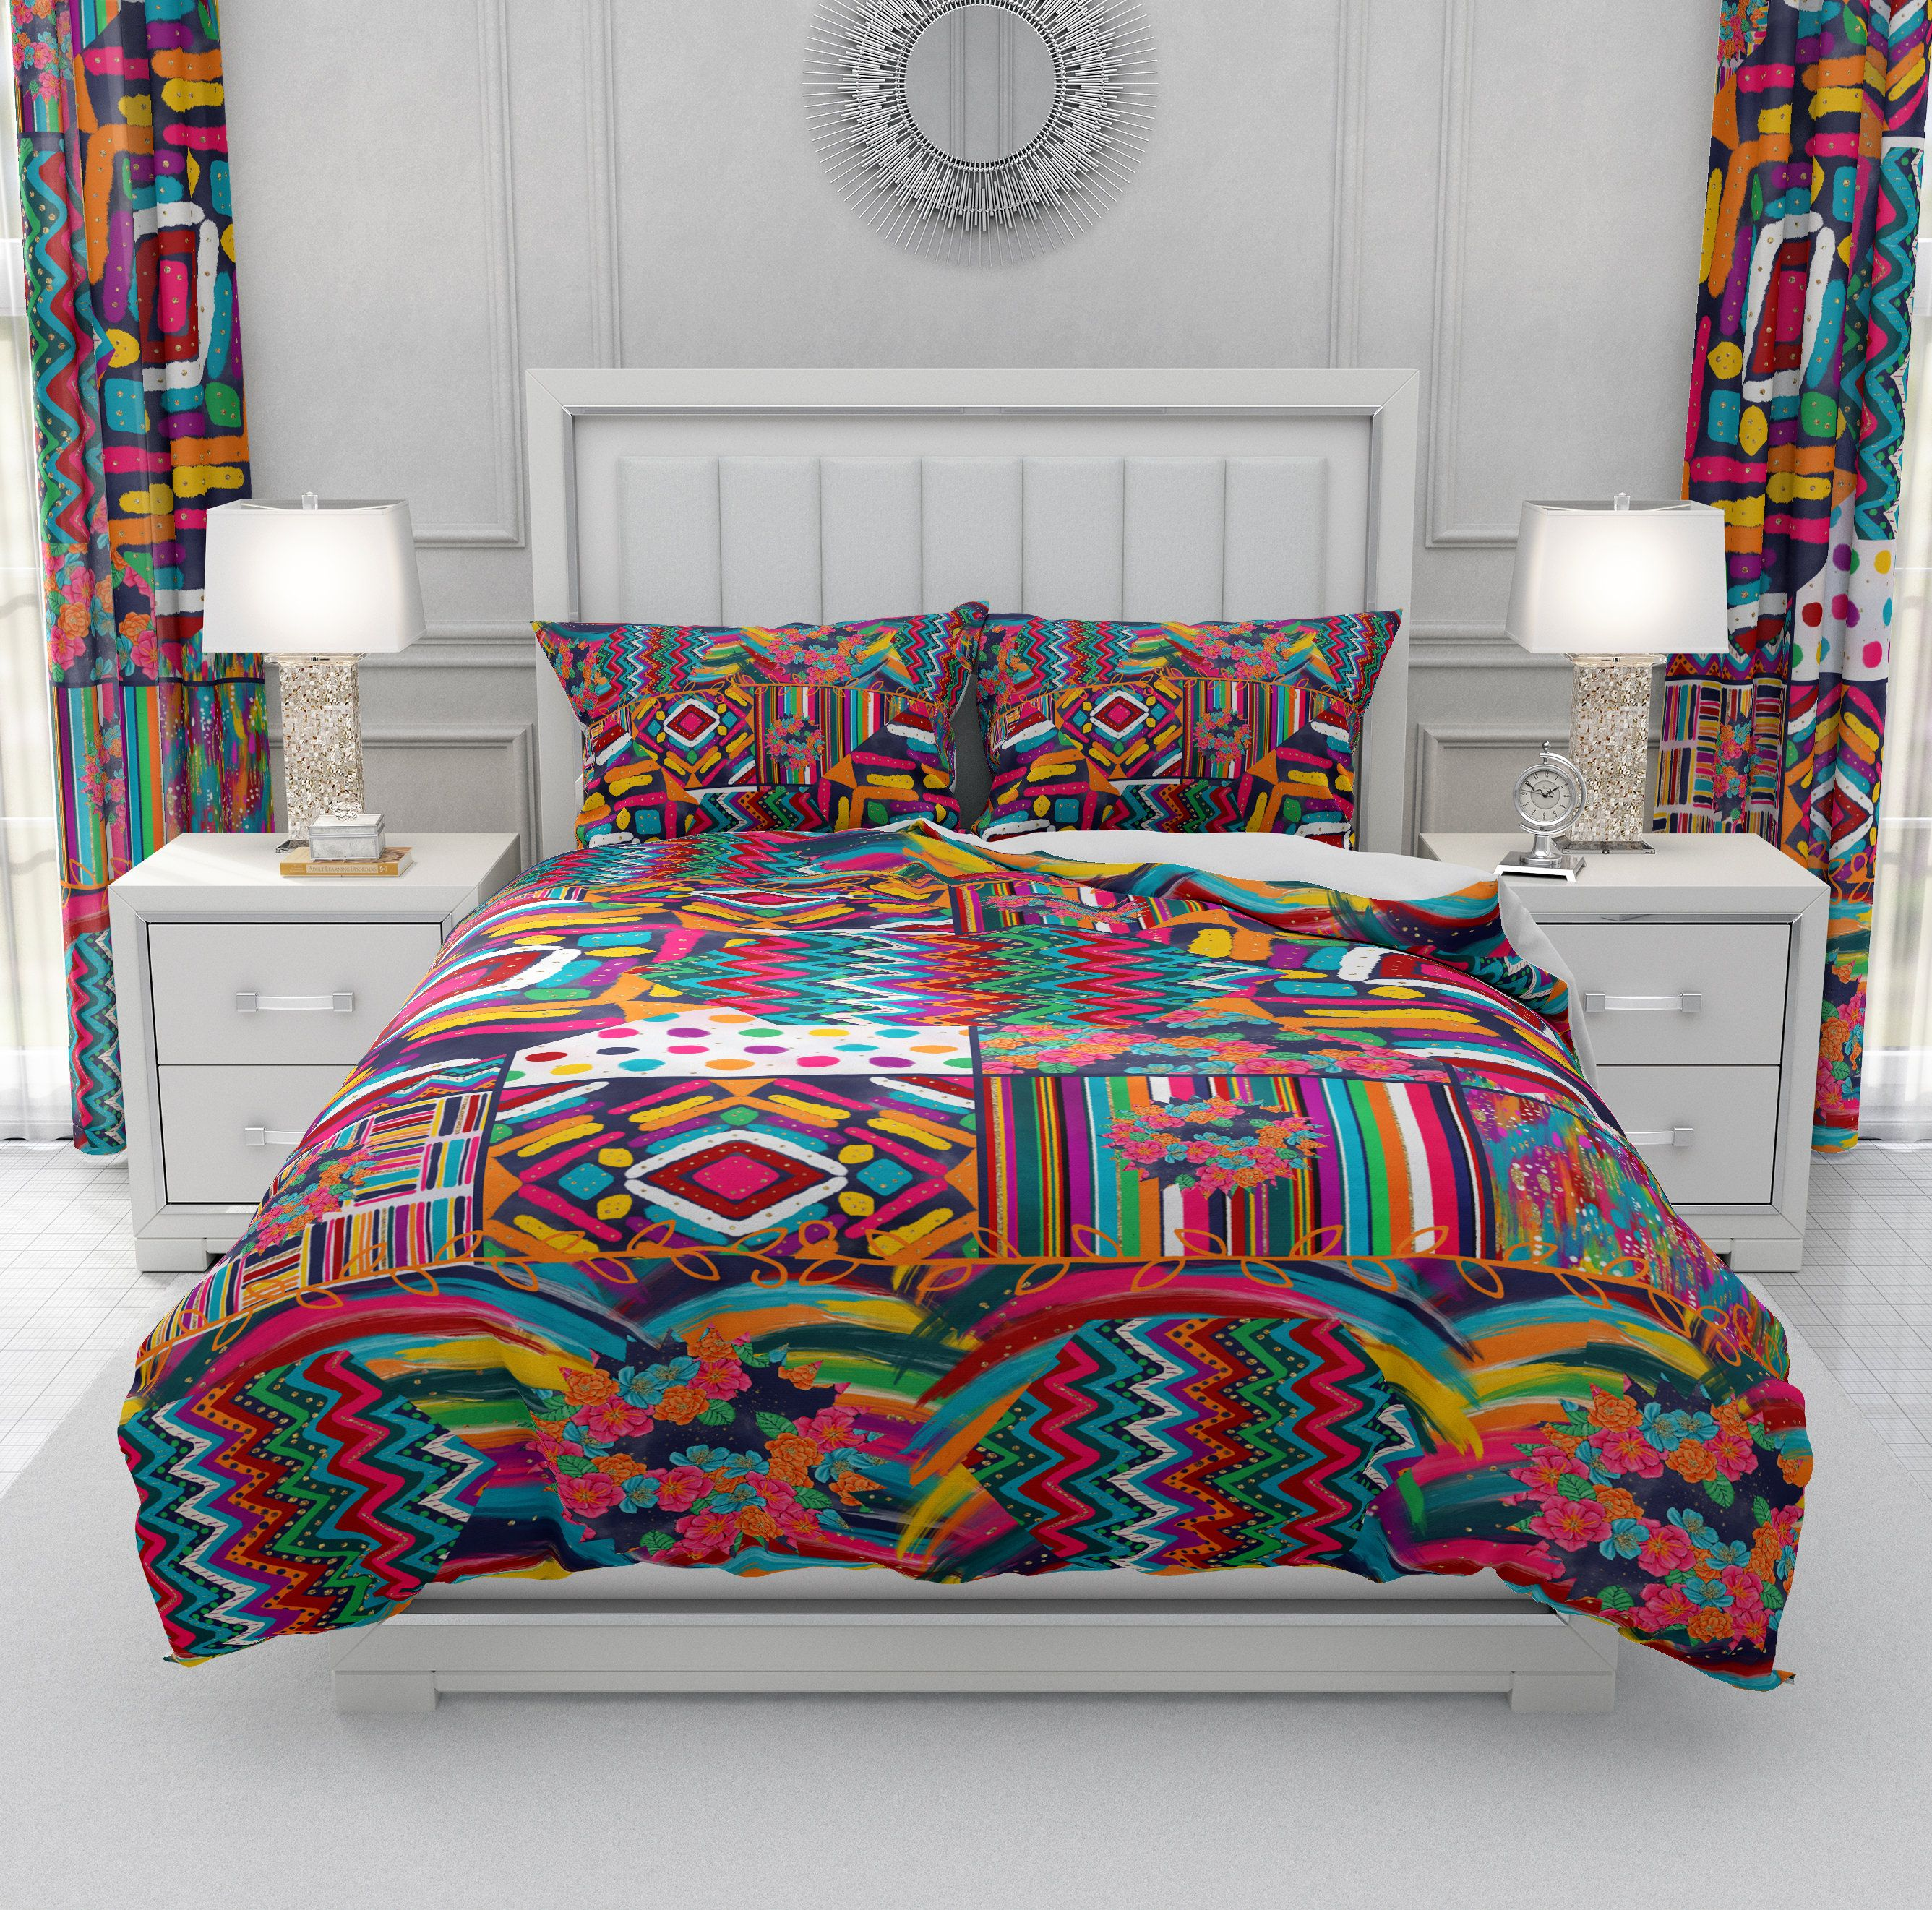 Geometric Colorful Boho Bedding Set Comforter Or Duvet Cover Etsy Colorful Bedding Handmade Duvet Covers Boho Bedding Sets